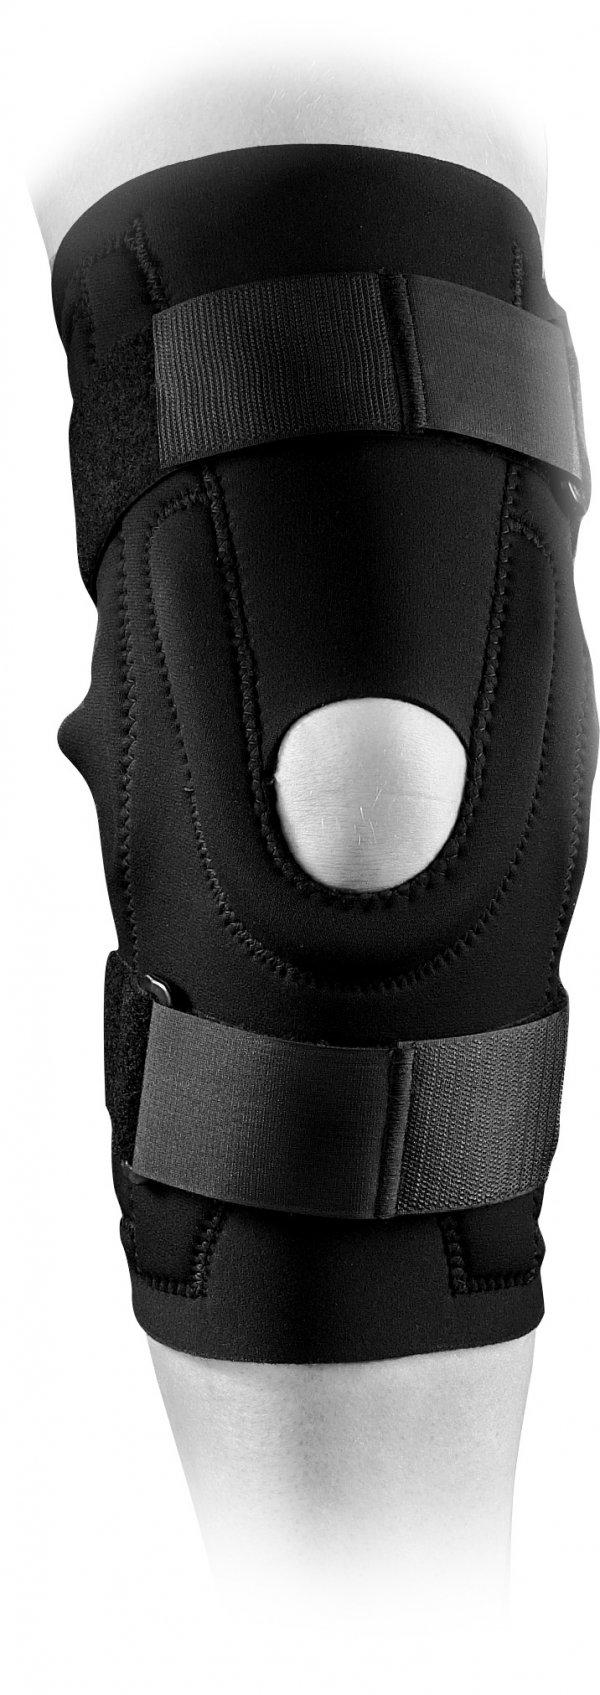 Permforma Knee Support